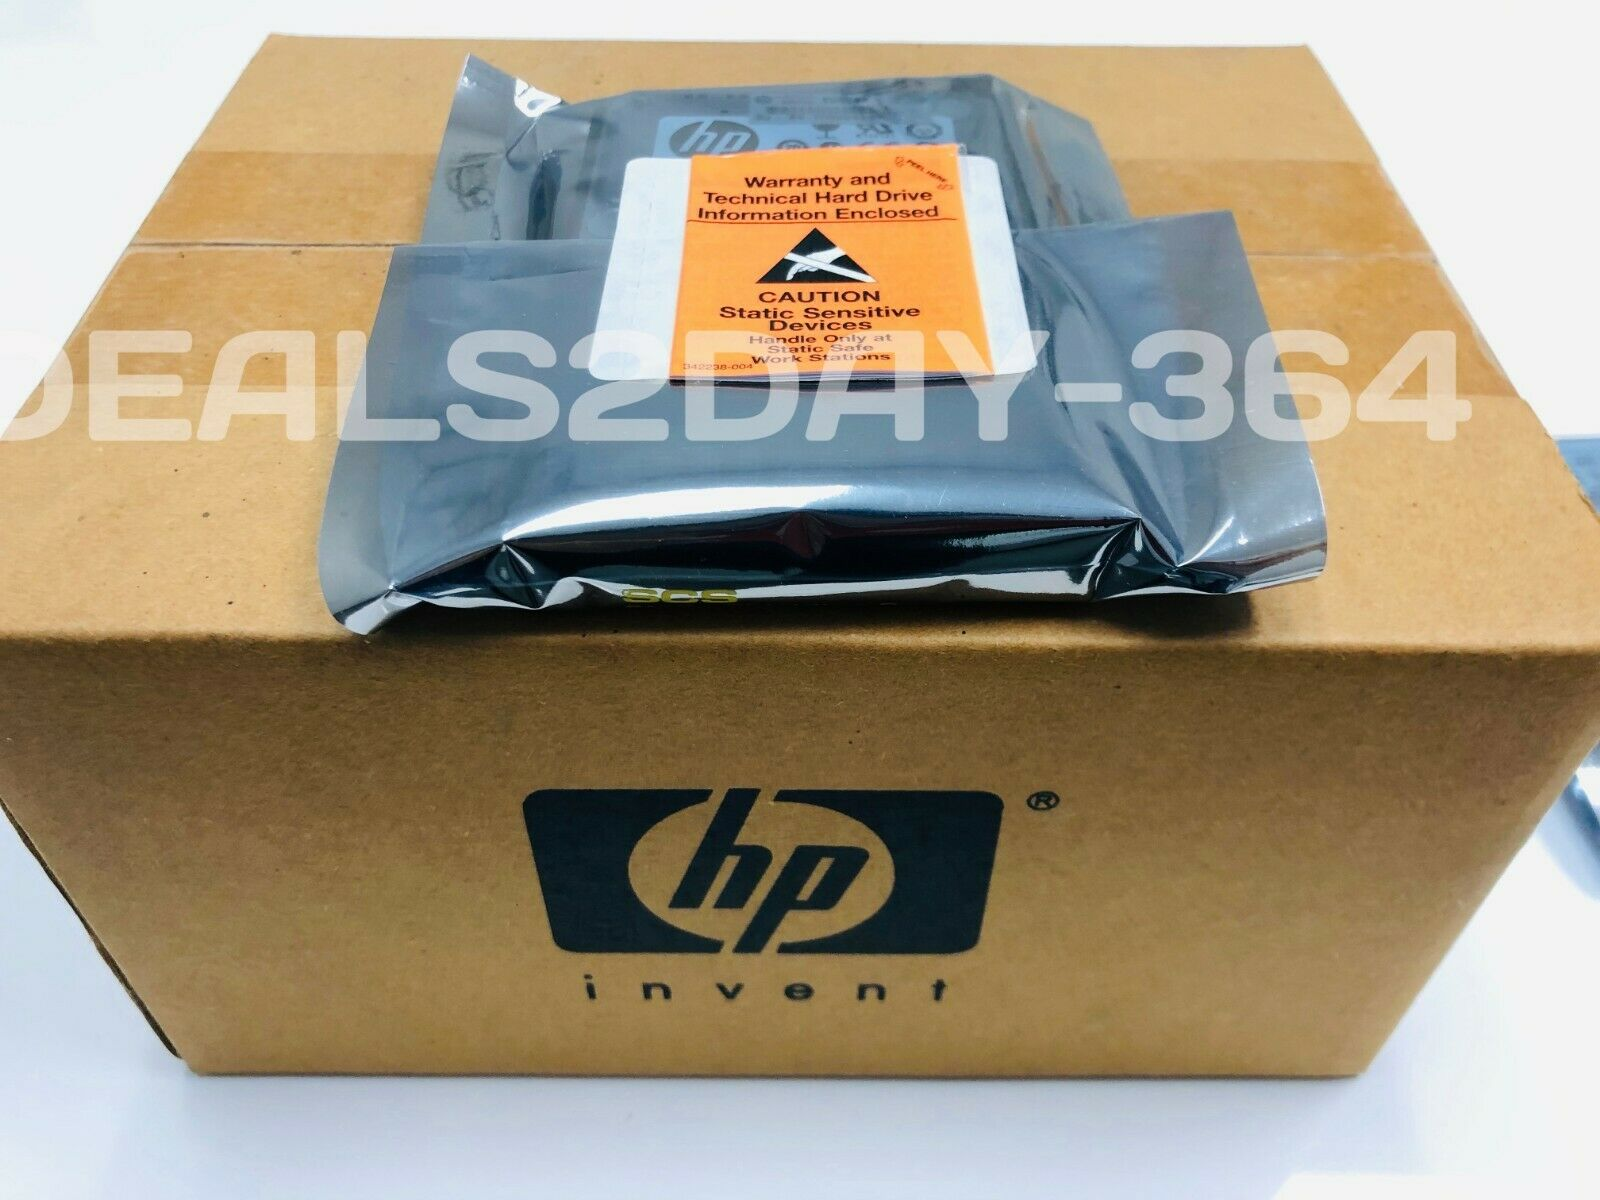 "HPE 605835-B21 1TB 7.2K RPM SAS 2.5/"" ENT HDD DP 606020-001 *NEW 0 HRS*"